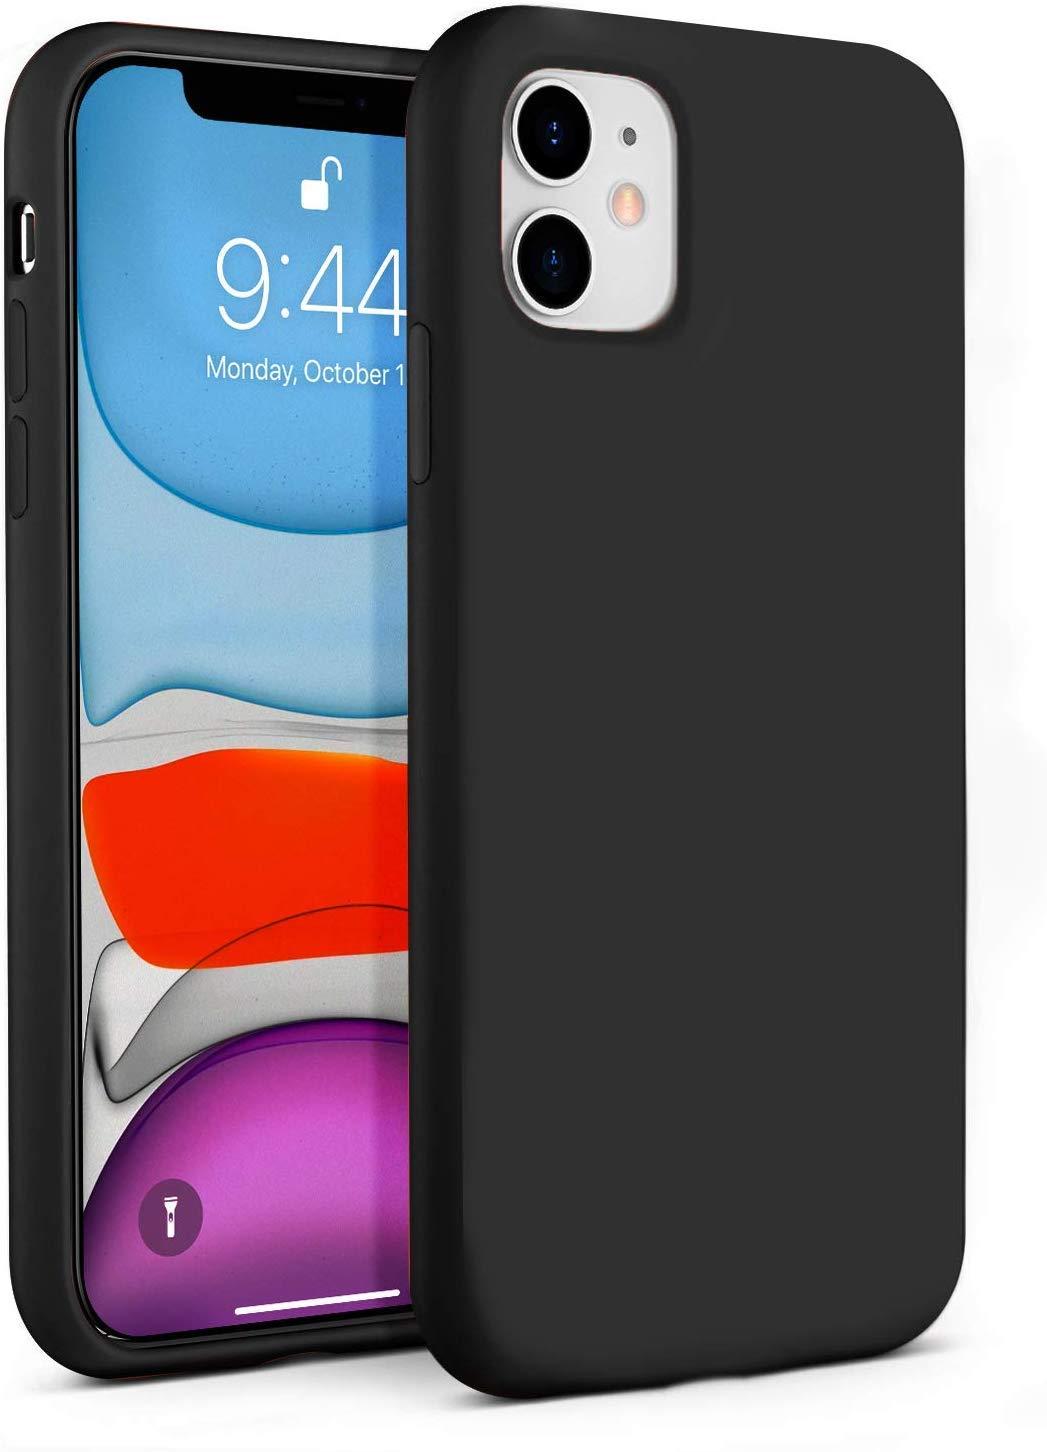 "IceSword iPhone 11 Case, Black iPhone 11 Silicone Case, Gel Rubber Full Body, iPhone 11 Cute iPhone 11 case, Soft Microfiber Cloth, 6.1"" iPhone 11 case Silicone, iPhone 11 case Cute - Black"